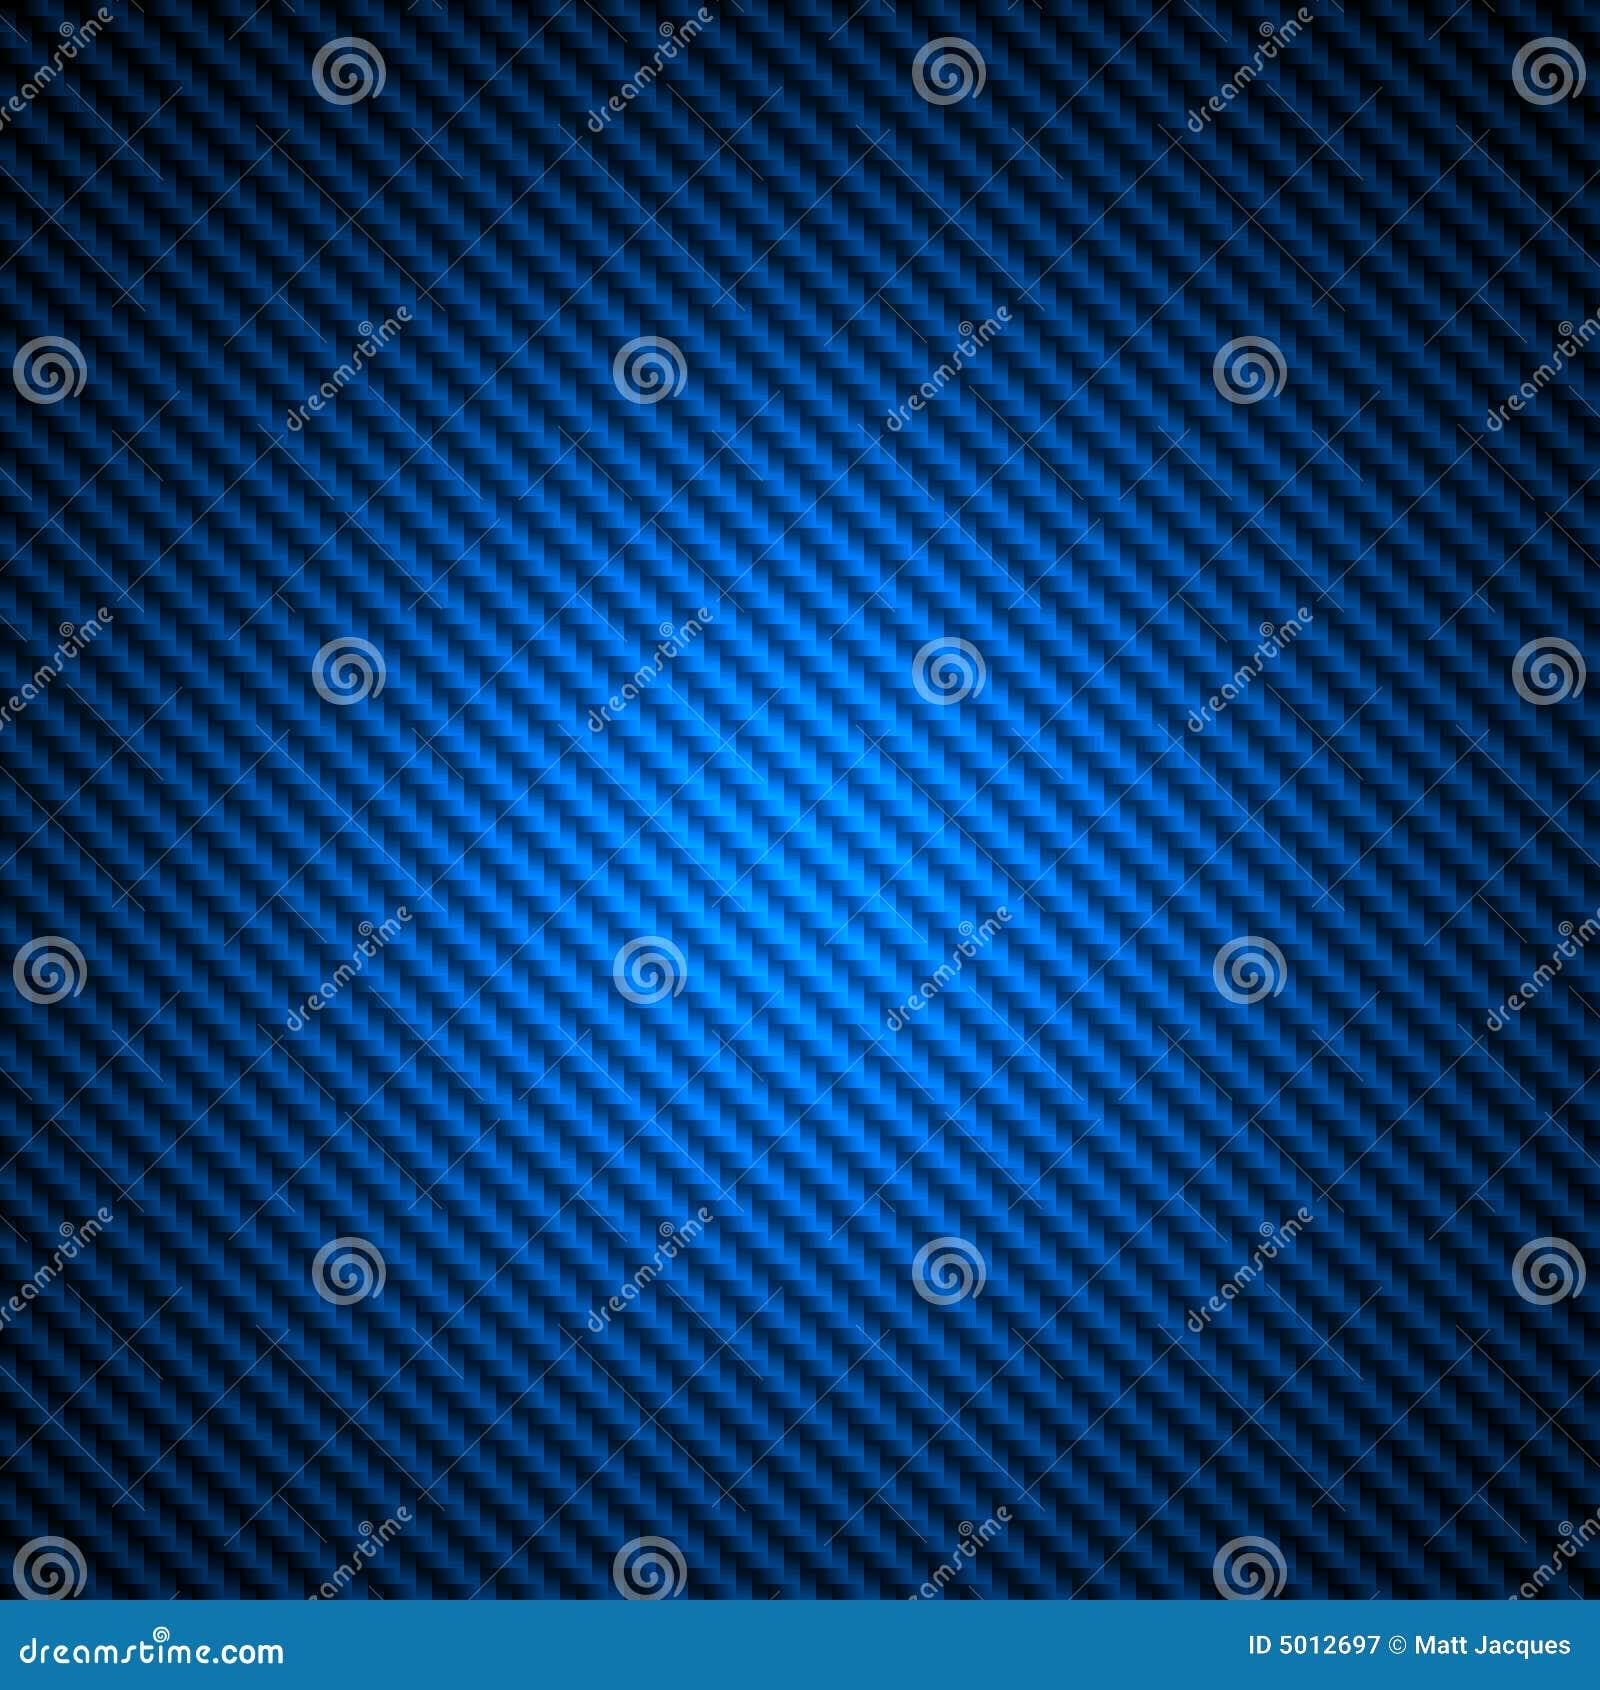 Texture Bleue De Fibre De Carbone De Fond Illustration Stock - Illustration du carbone, bleue ...